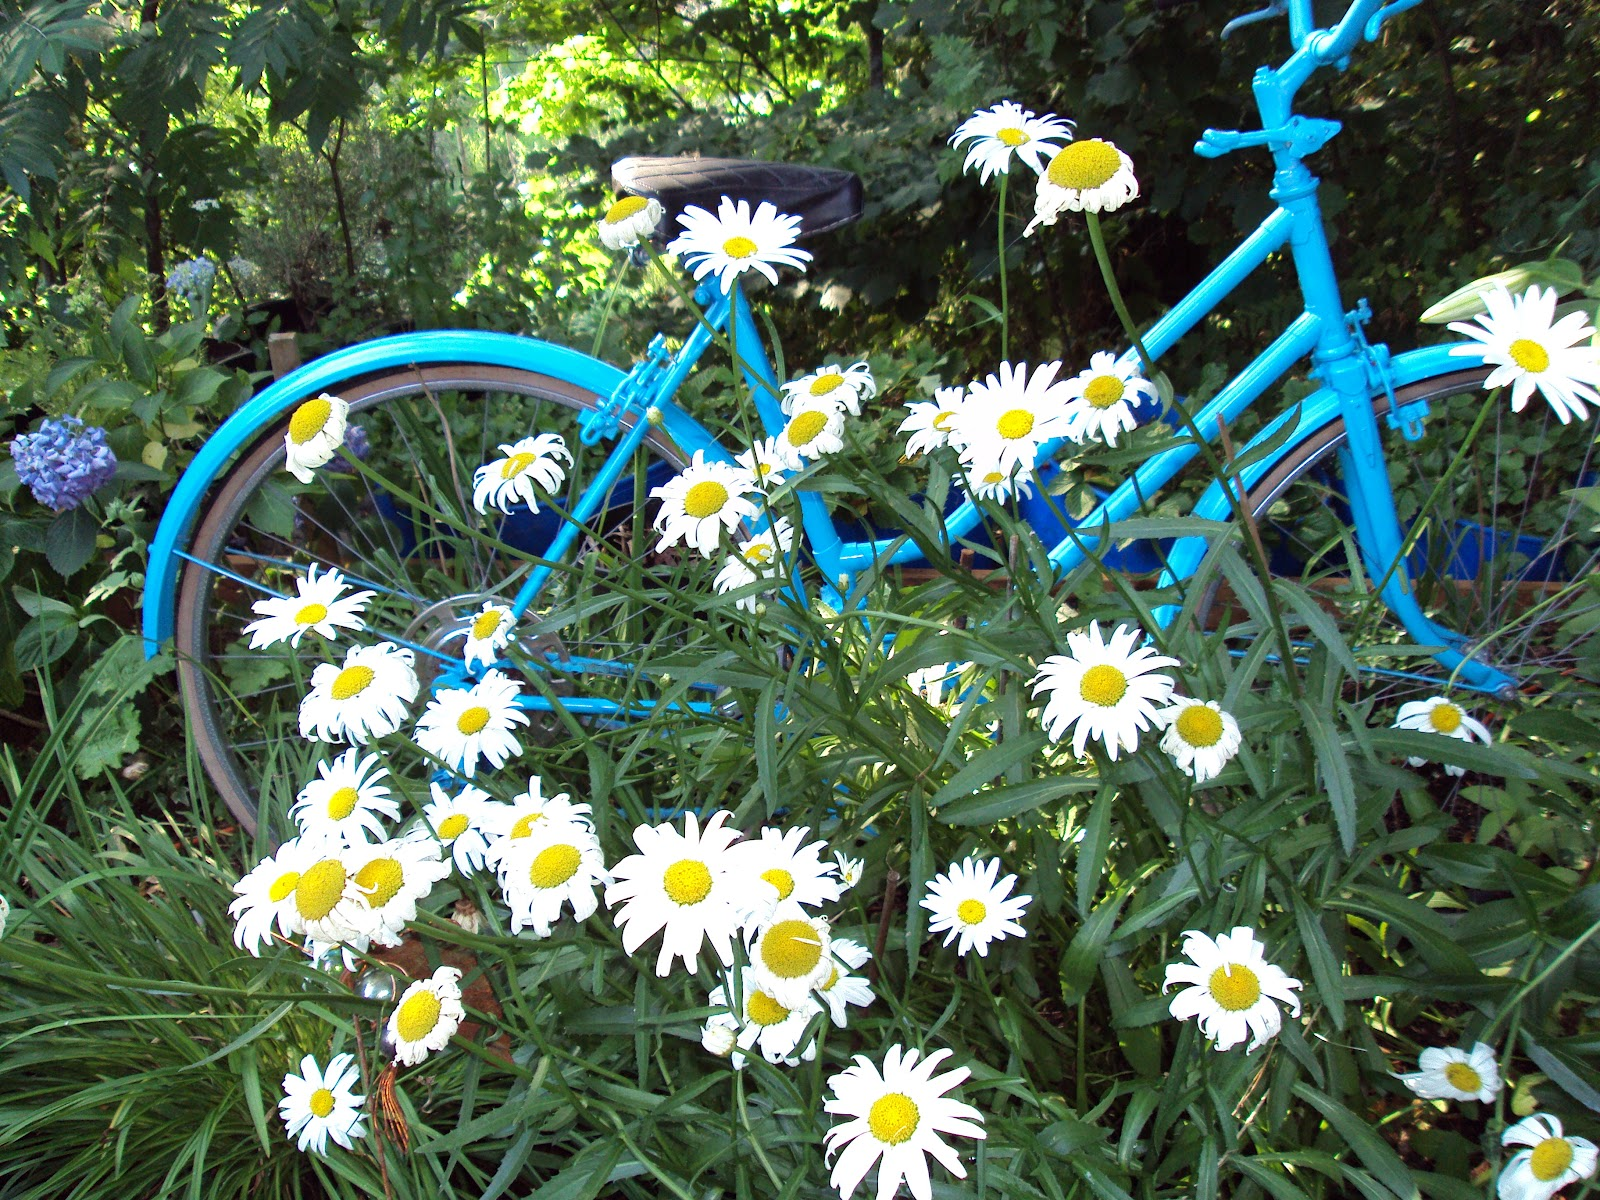 Linda's Serenity Garden: Garden Design - Garden Focal Points